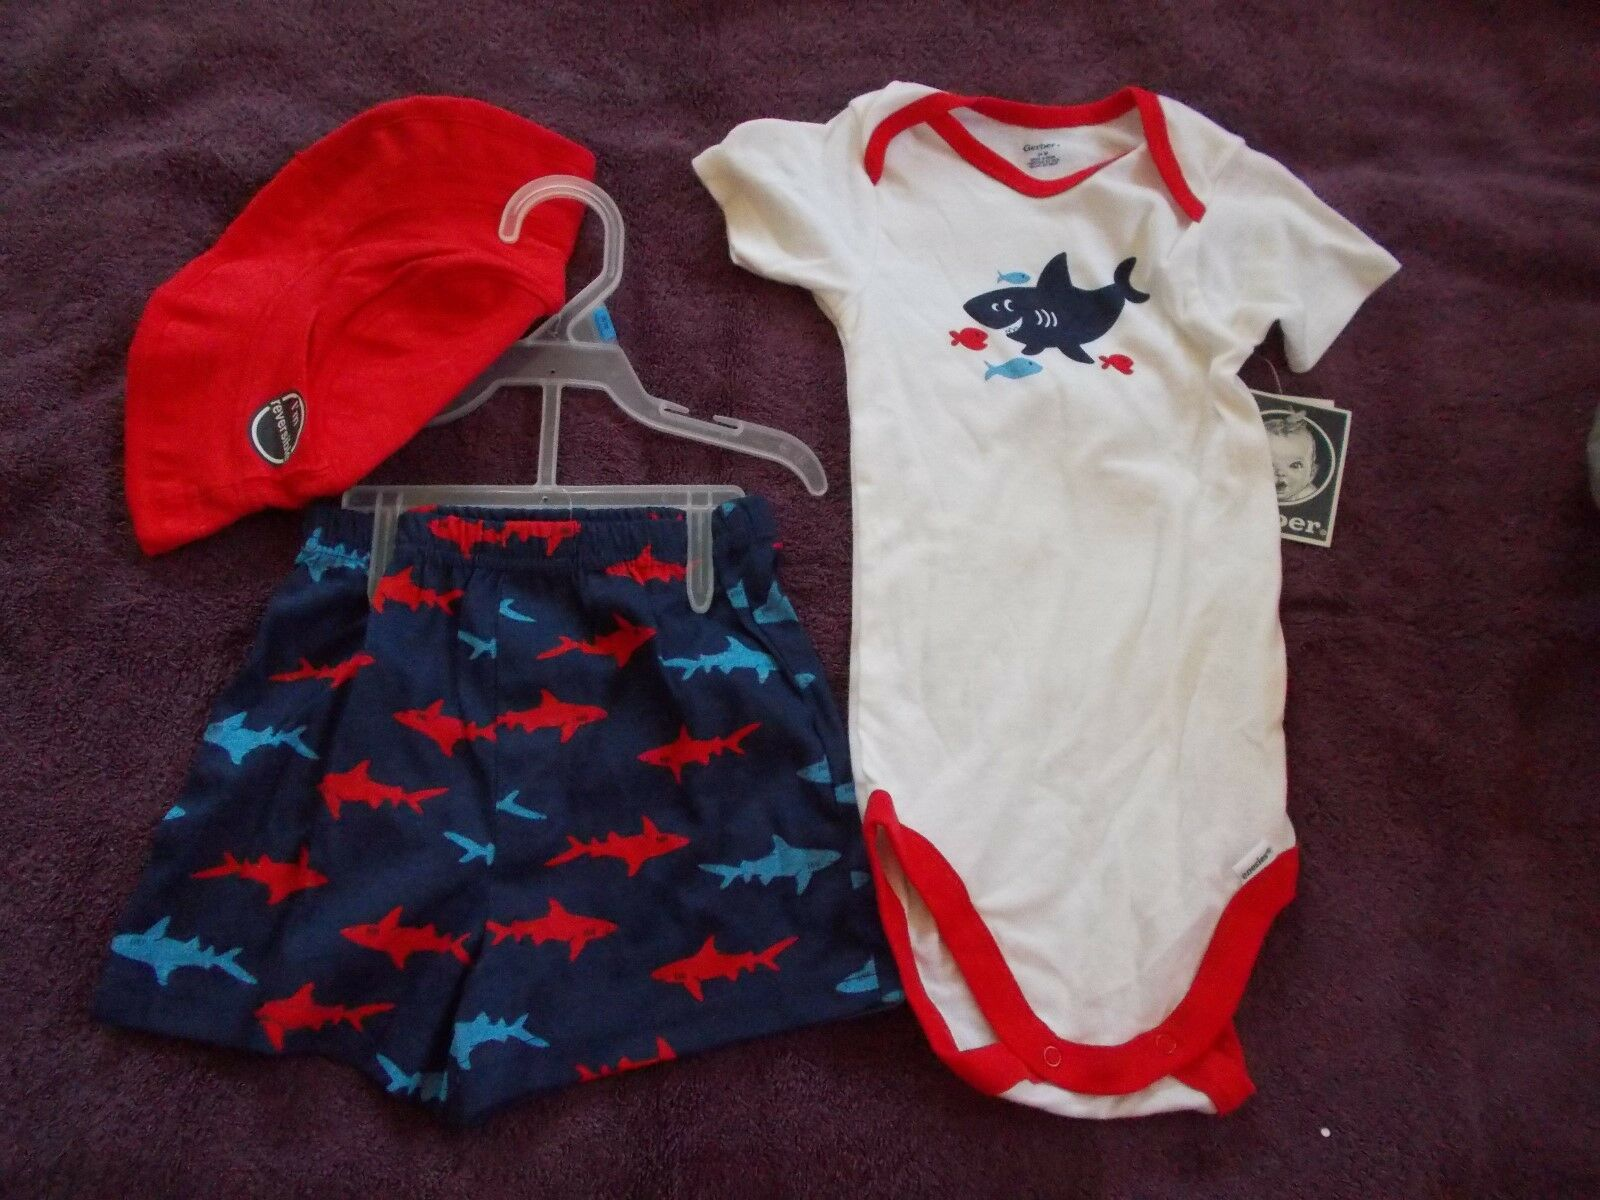 Gerber Baby Clothing UPC & Barcode